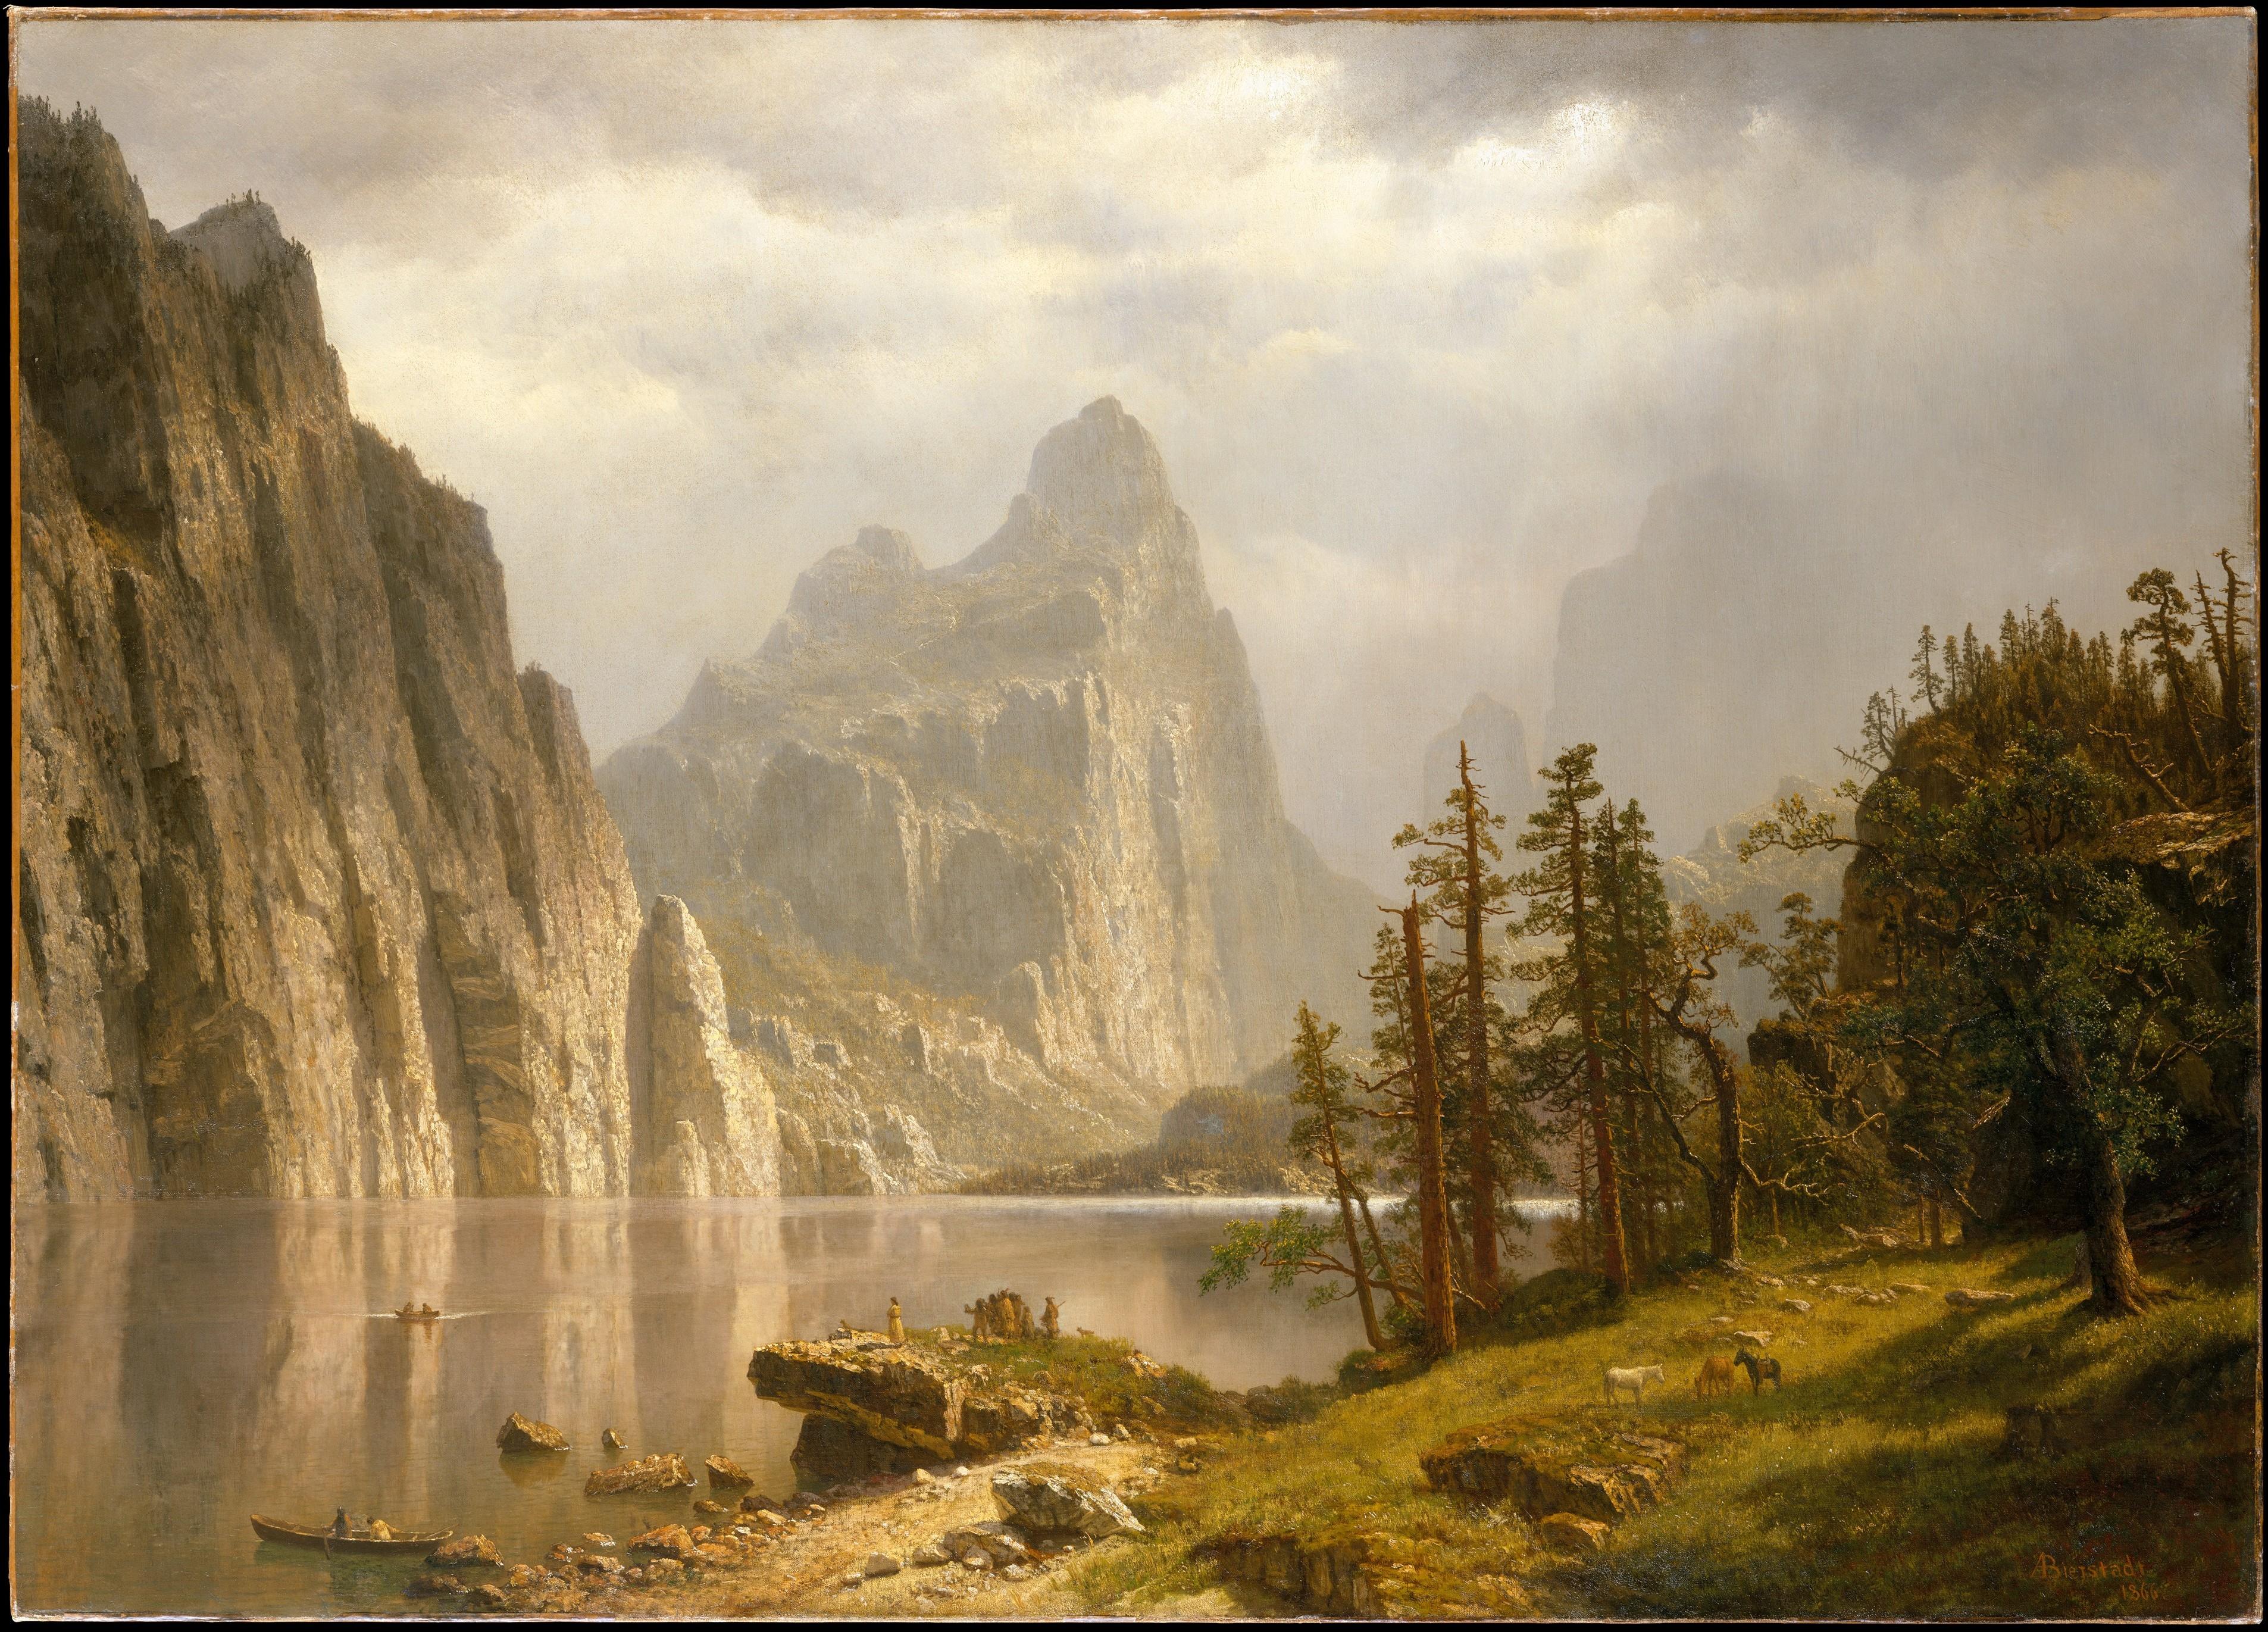 California landscape in art: Albert Bierstadt, Merced River, Yosemite Valley, ca. 1866, The Metropolitan Museum of Arts, New York, NY, USA.